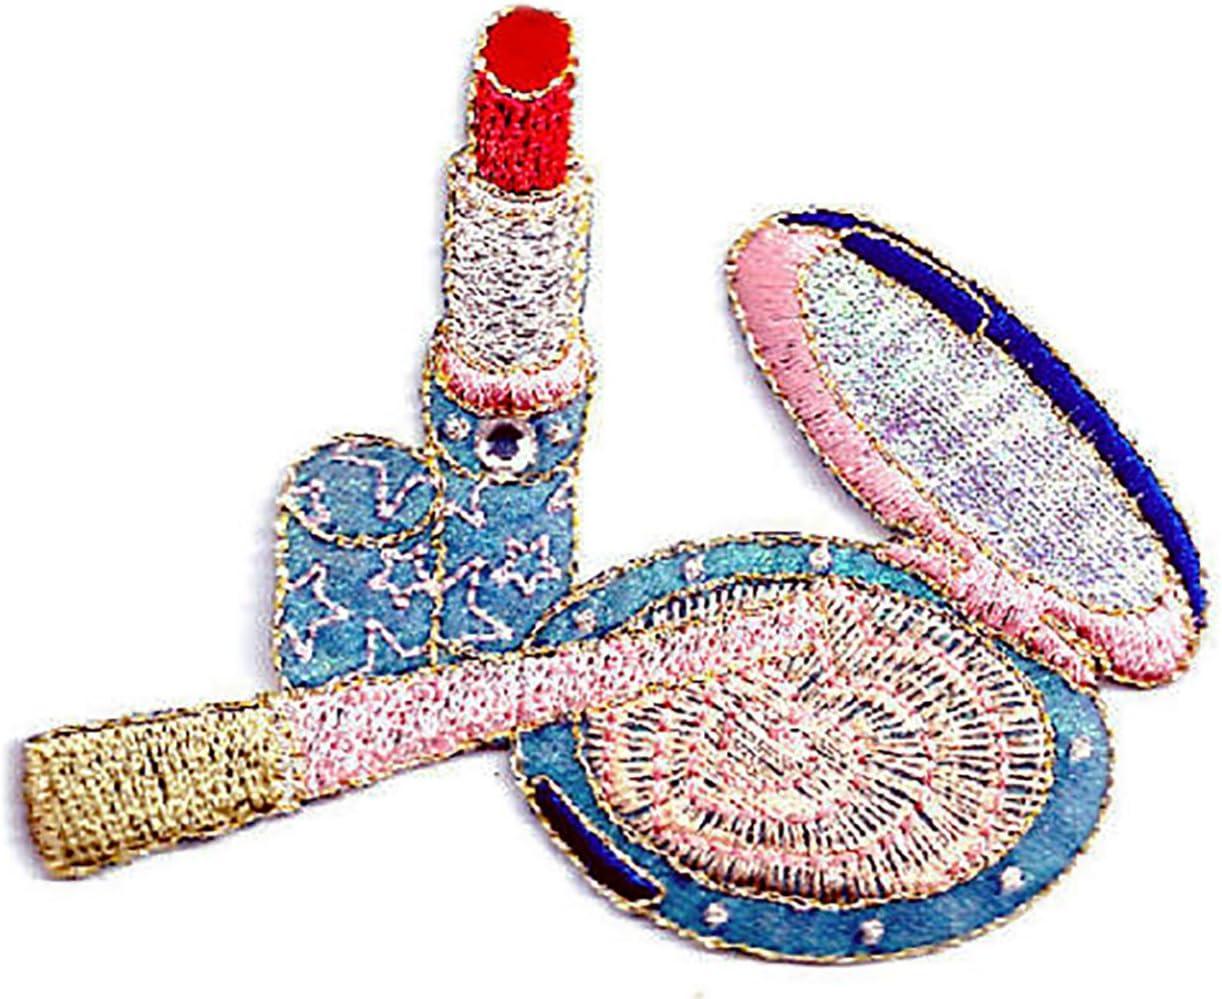 5 Powder Compact /& Lipstick Card Making Scrapbook Craft Embellishments Supplies